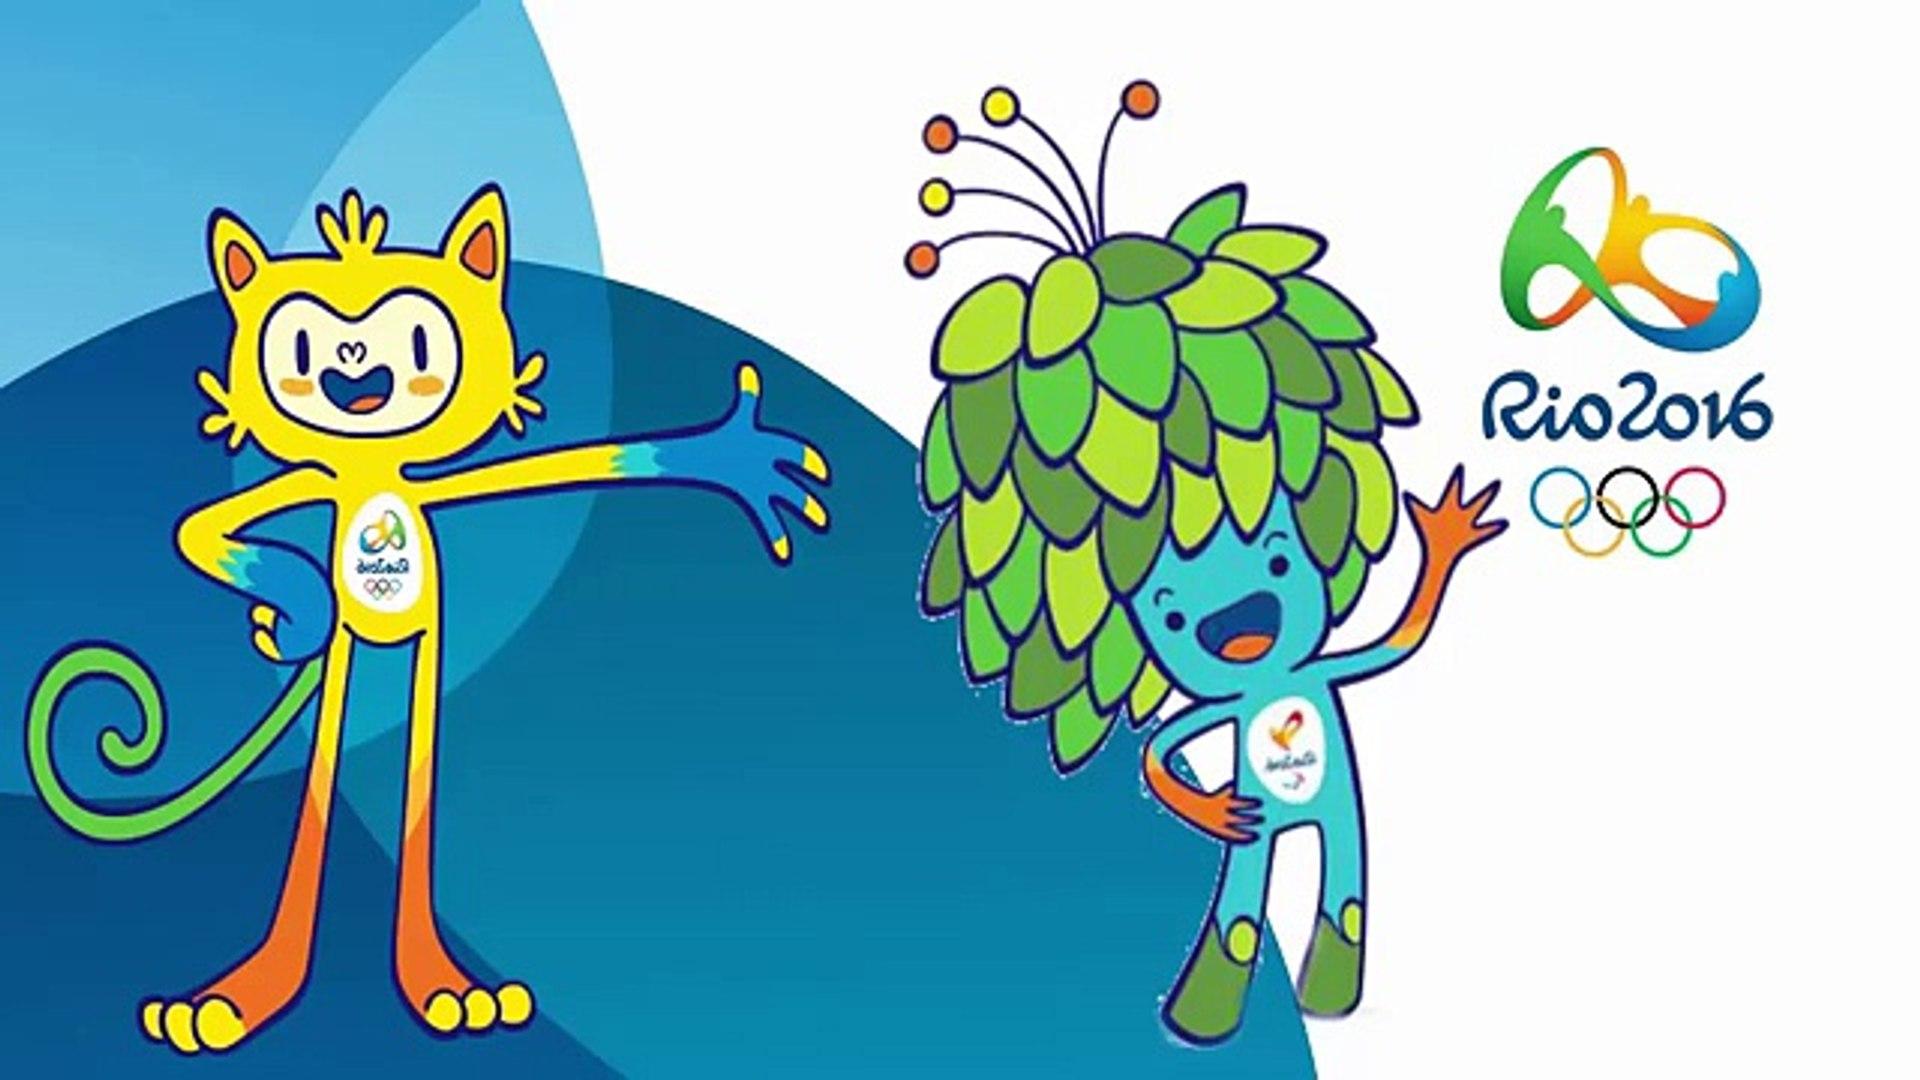 Rio 2016 Desenho Mascotes Brasil olimpíadas 2016 Design Mascot Olympics Rio 2016